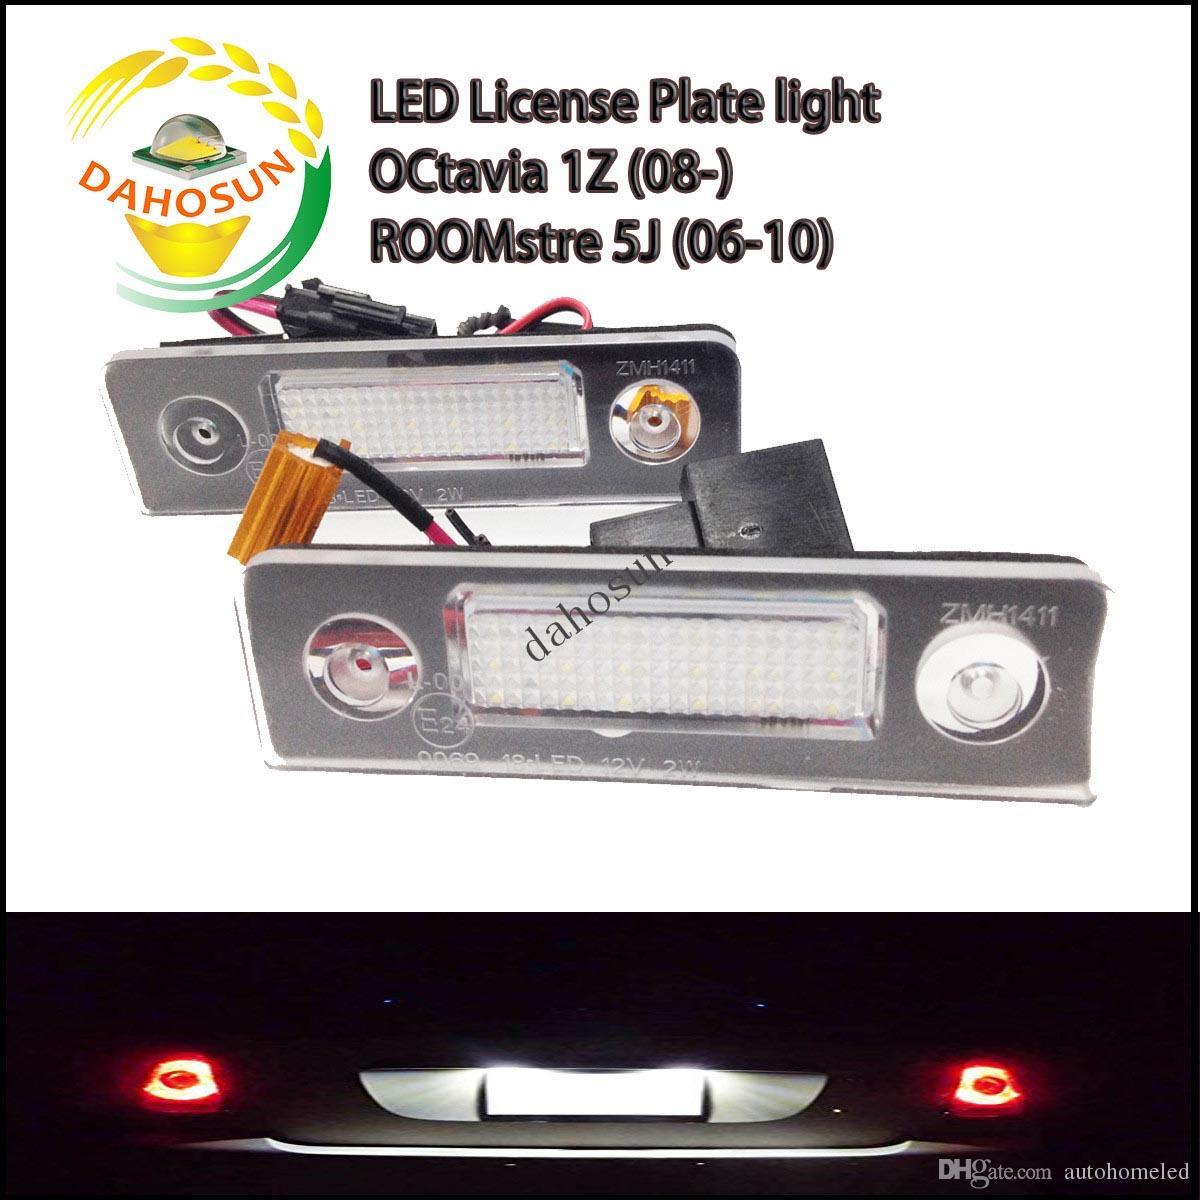 X License Lamp For Octavia 1z 2008 Up Roomster 5j Car Number Plate